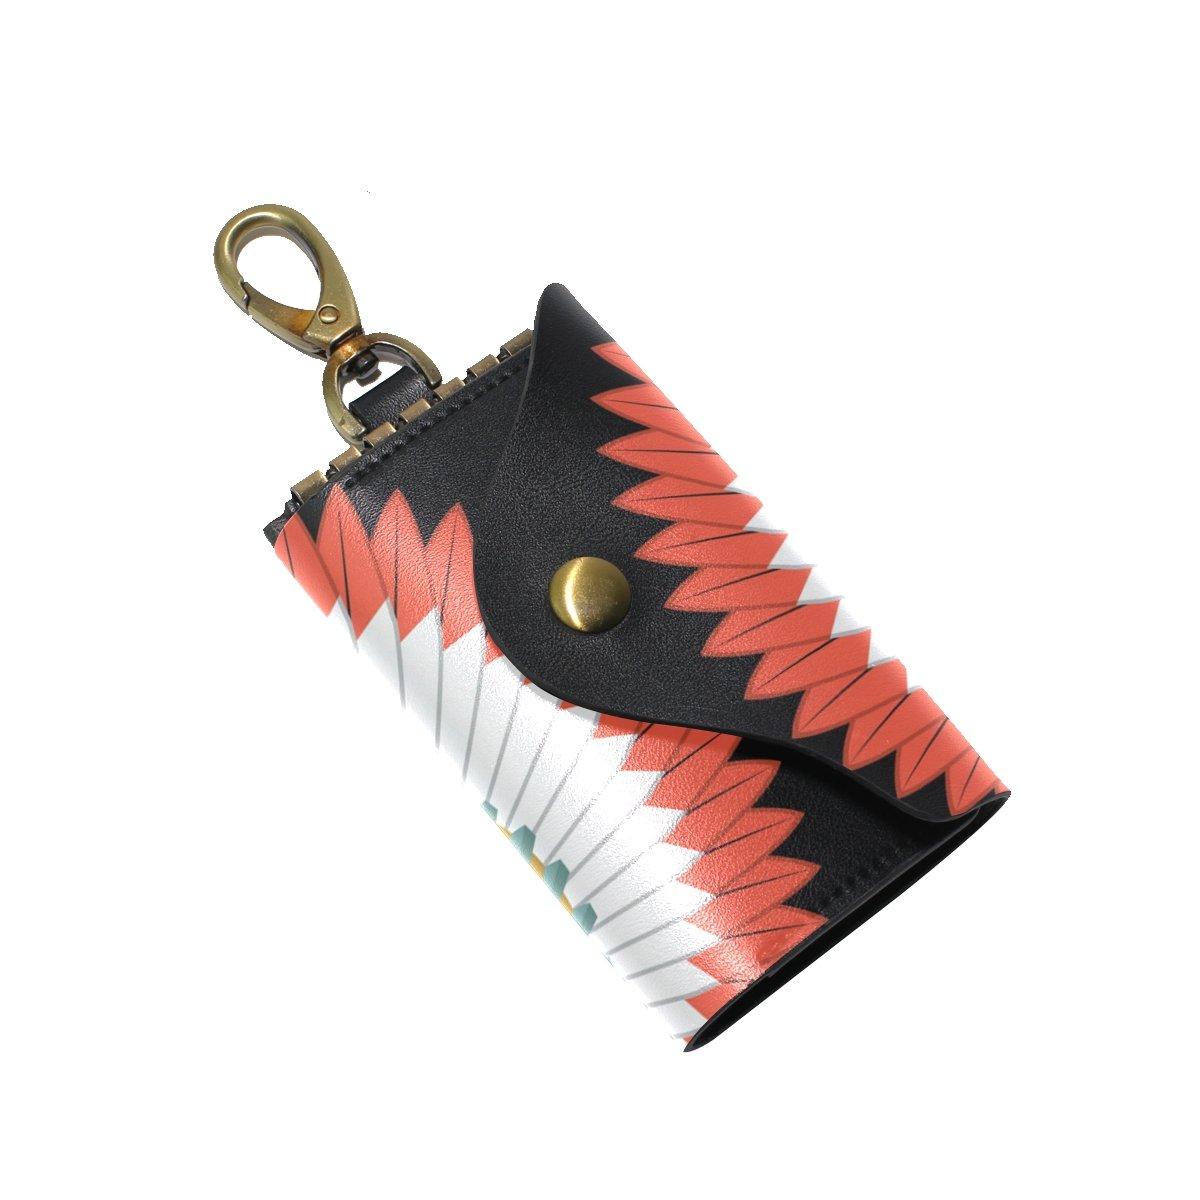 DEYYA American Indian Skull Headdress Leather Key Case Wallets Unisex Keychain Key Holder with 6 Hooks Snap Closure